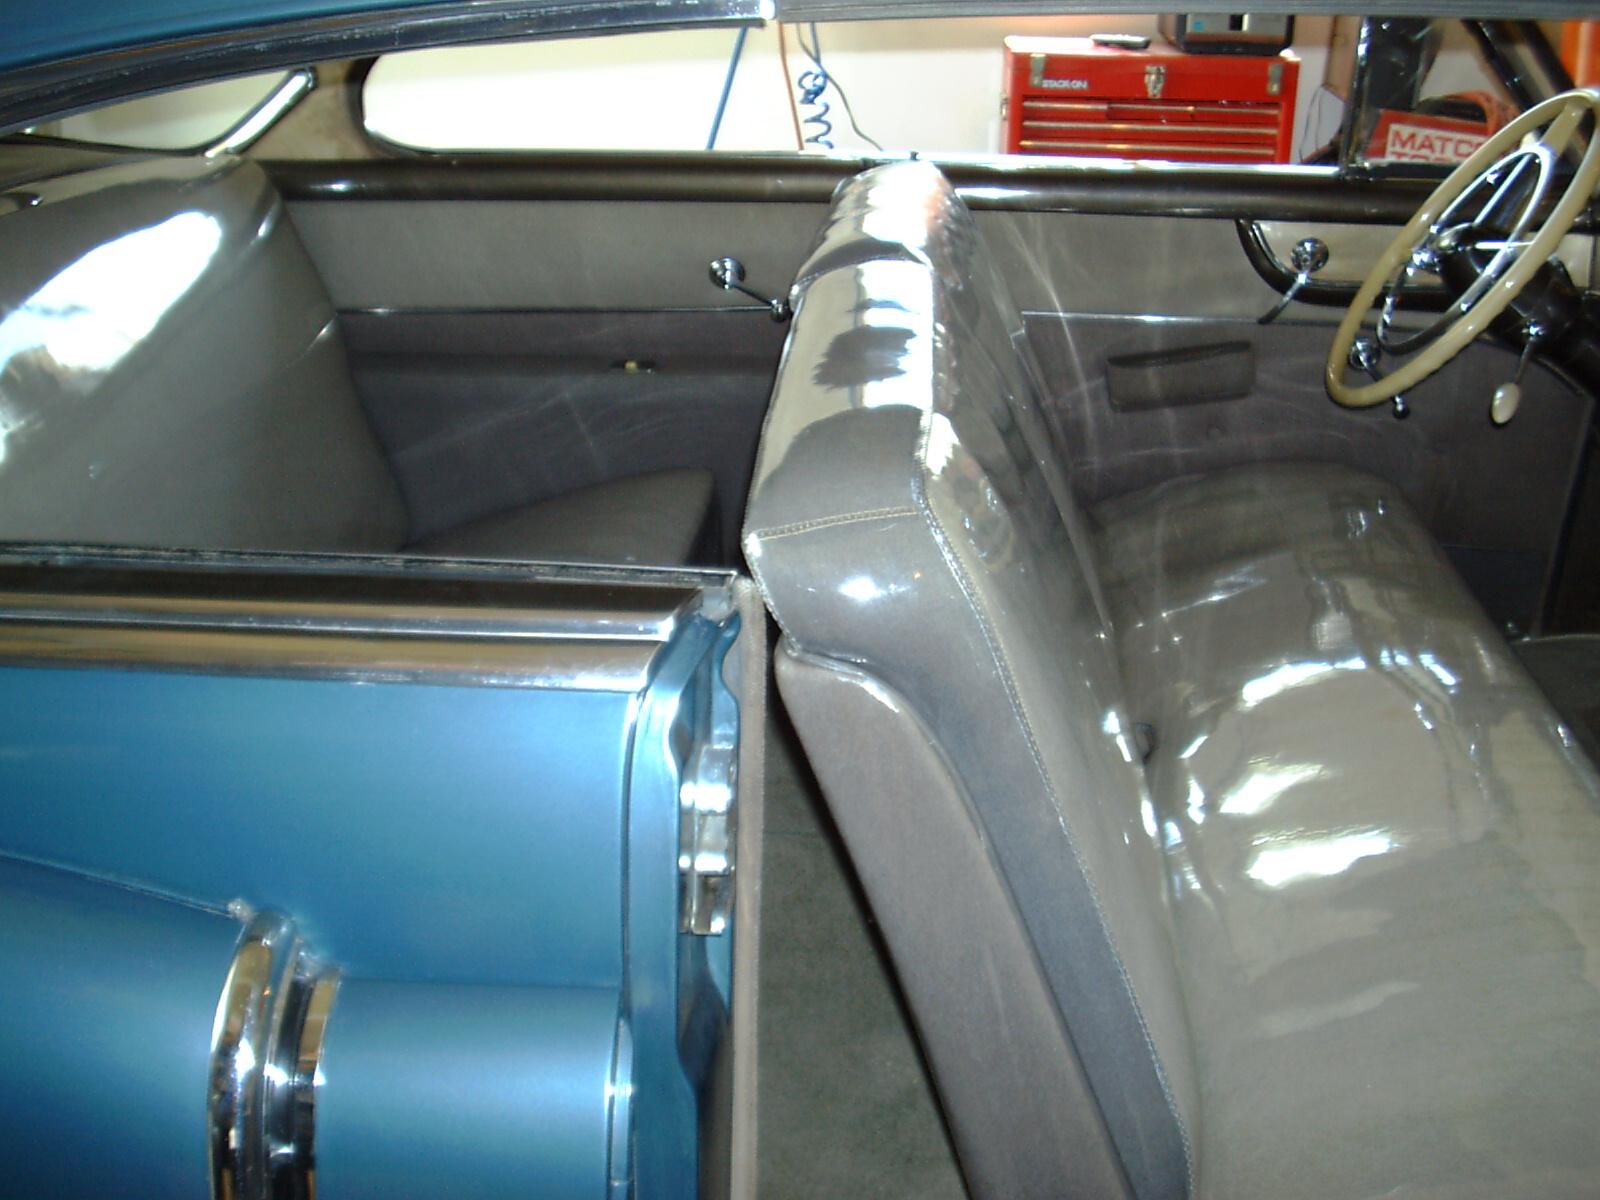 Outstanding Pictures Of Cars Pictures Of Seats Pictures Of Interiors Inzonedesignstudio Interior Chair Design Inzonedesignstudiocom